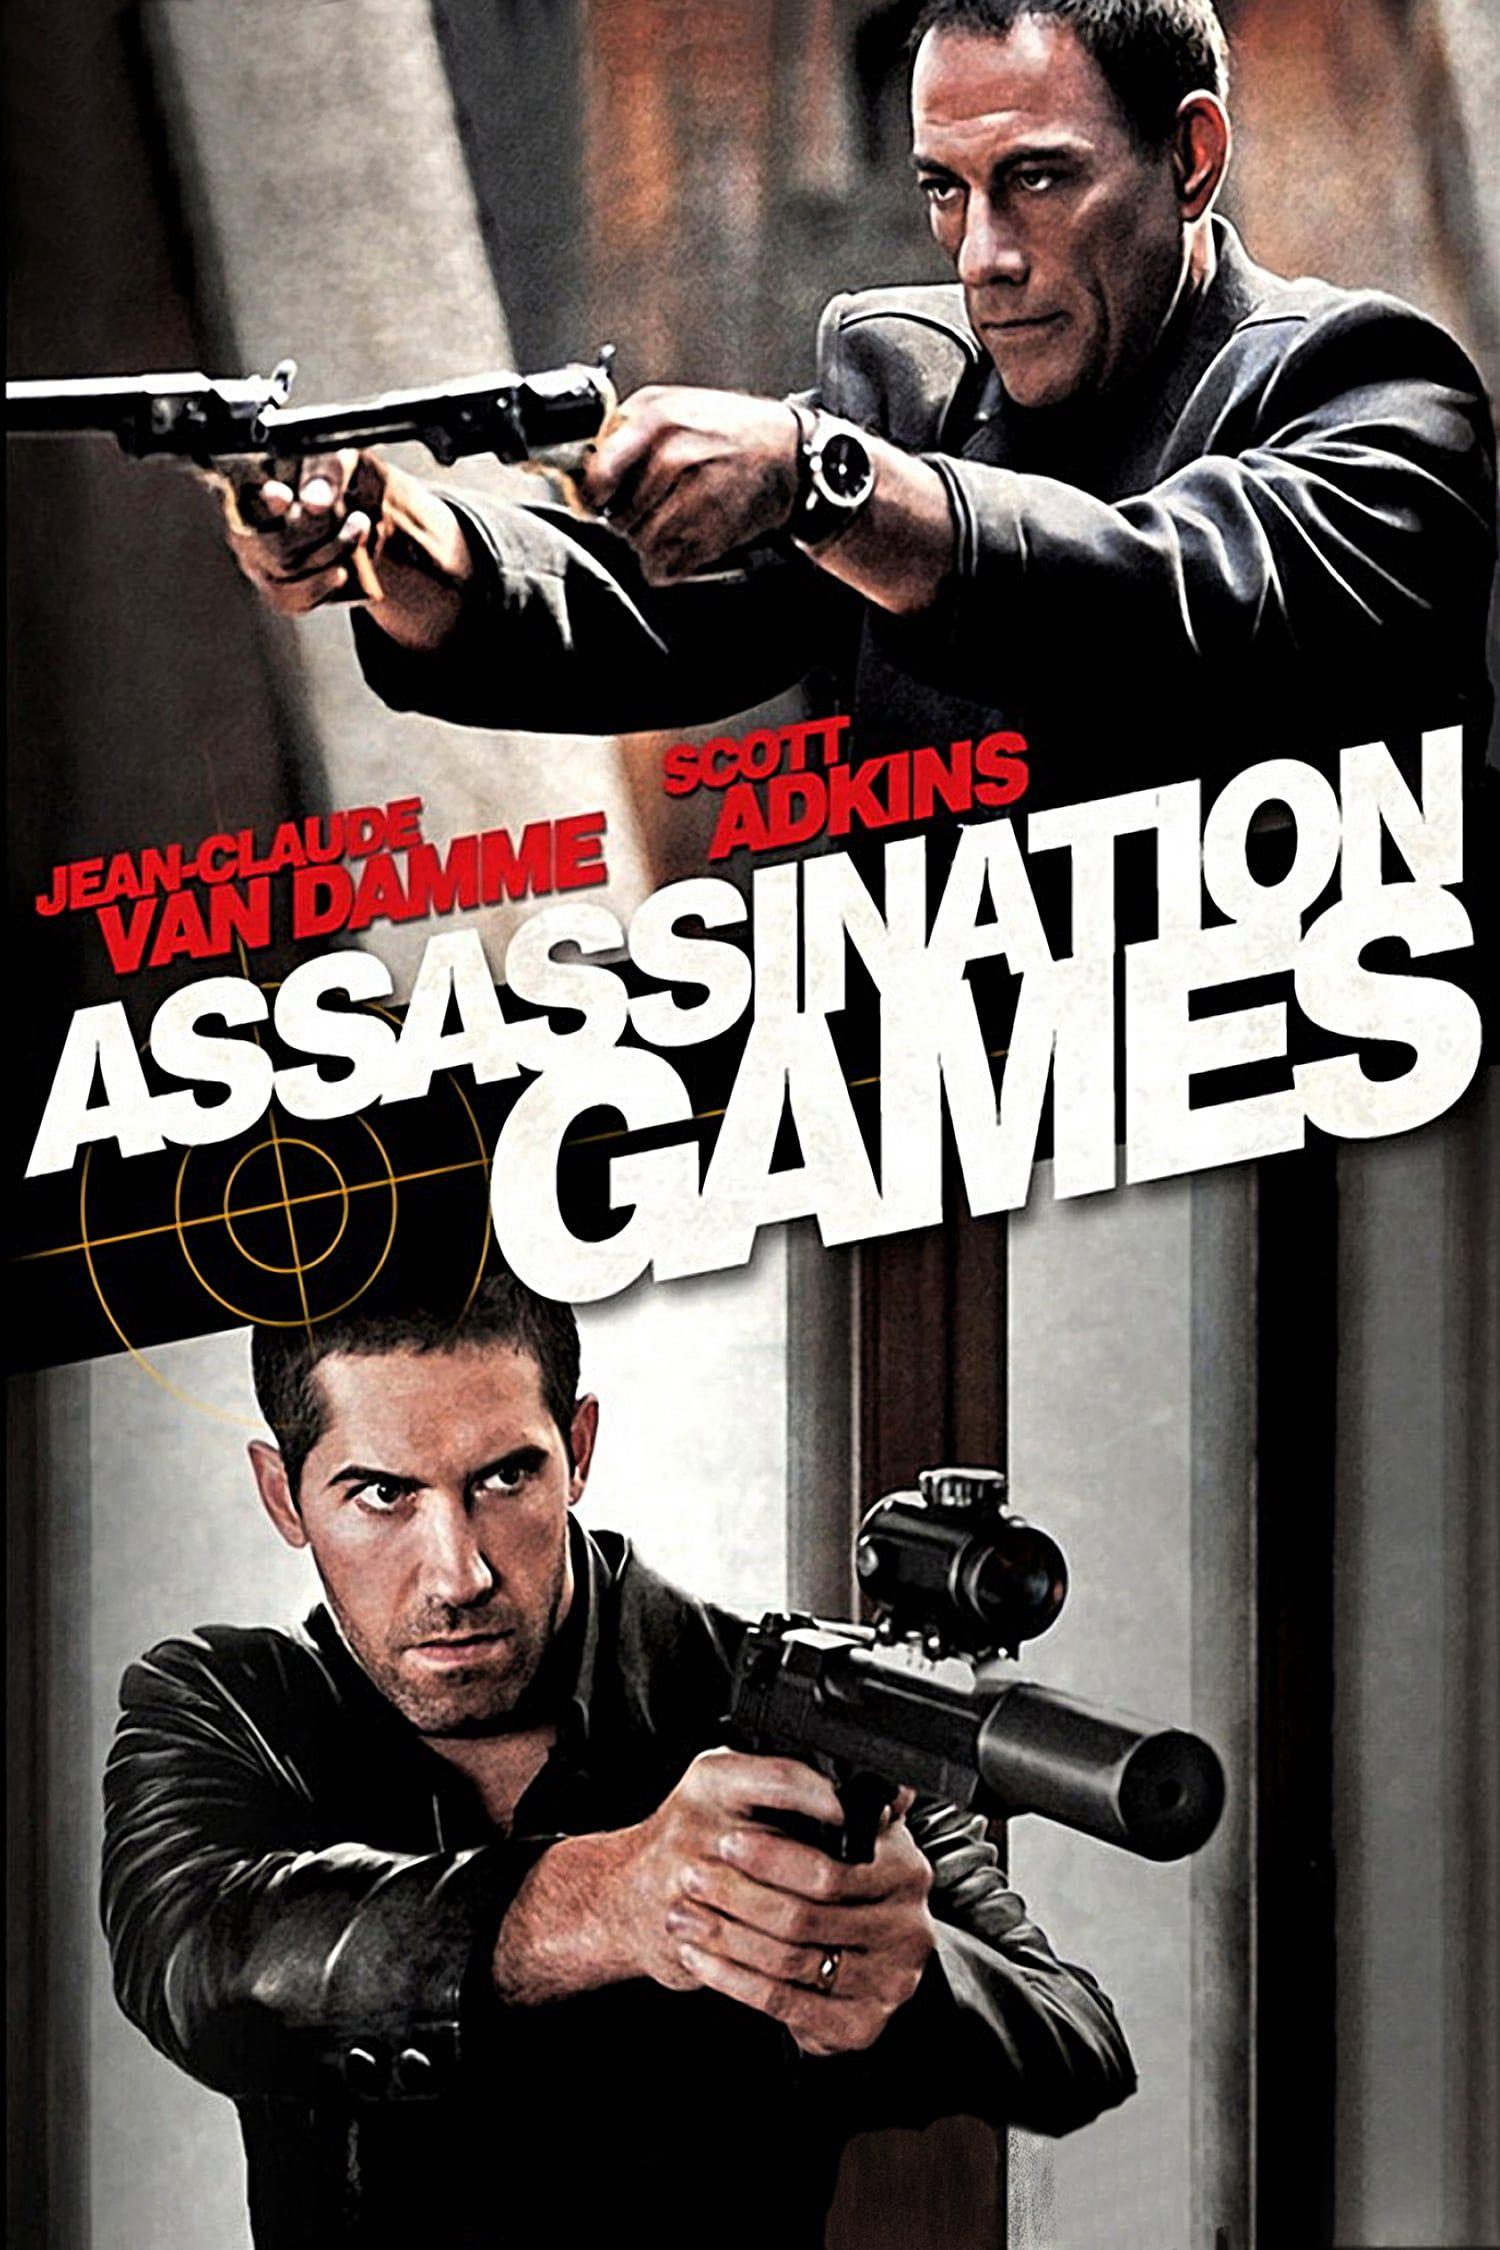 Pelicula Juego De Asesinos 2011 Hd 1080p Latino Ingles Online Imagen Free Movies Online Scott Adkins Full Movies Online Free